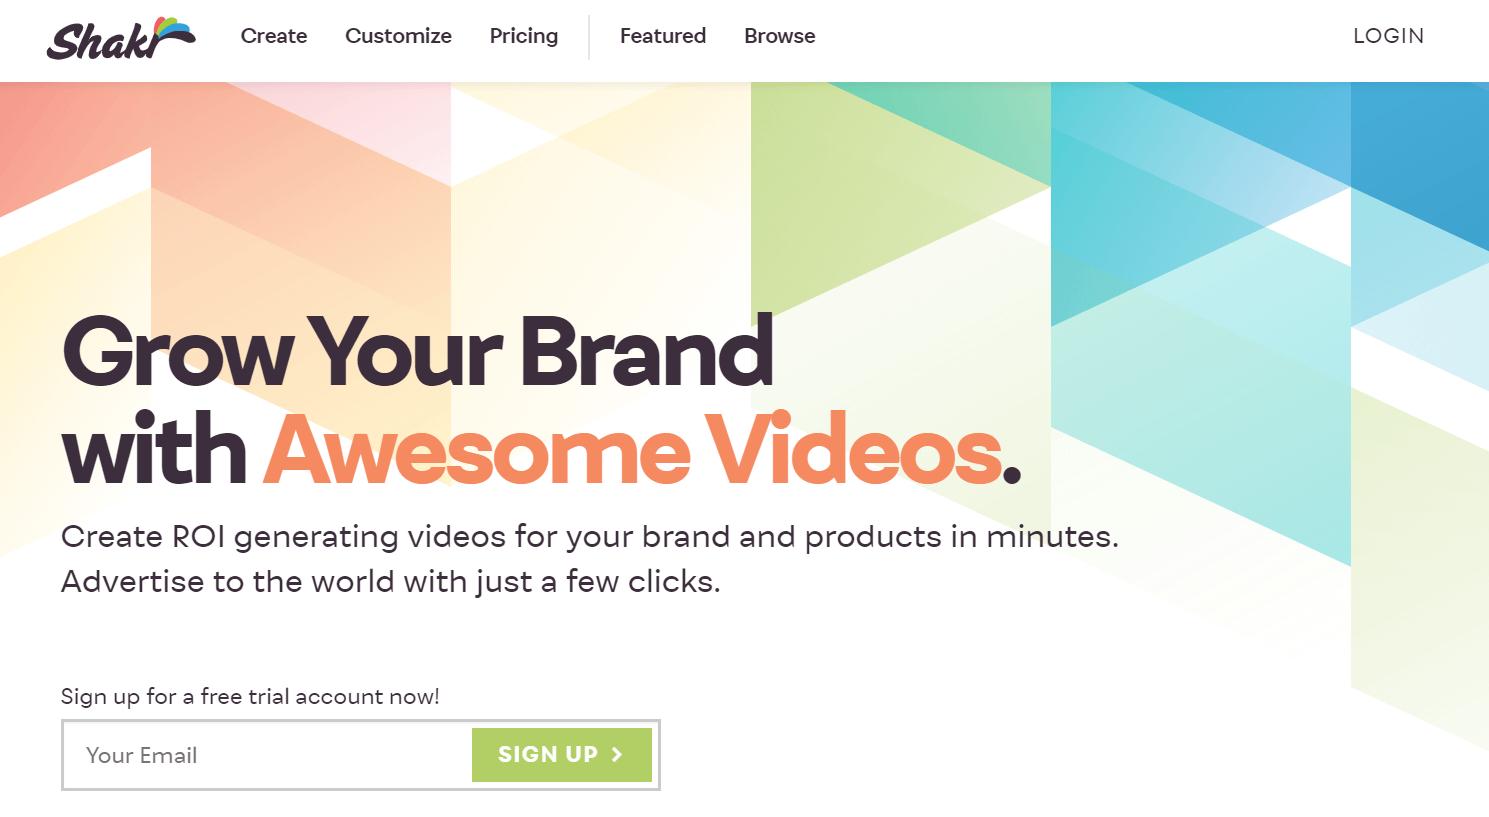 Shakr Video Marketing Tool